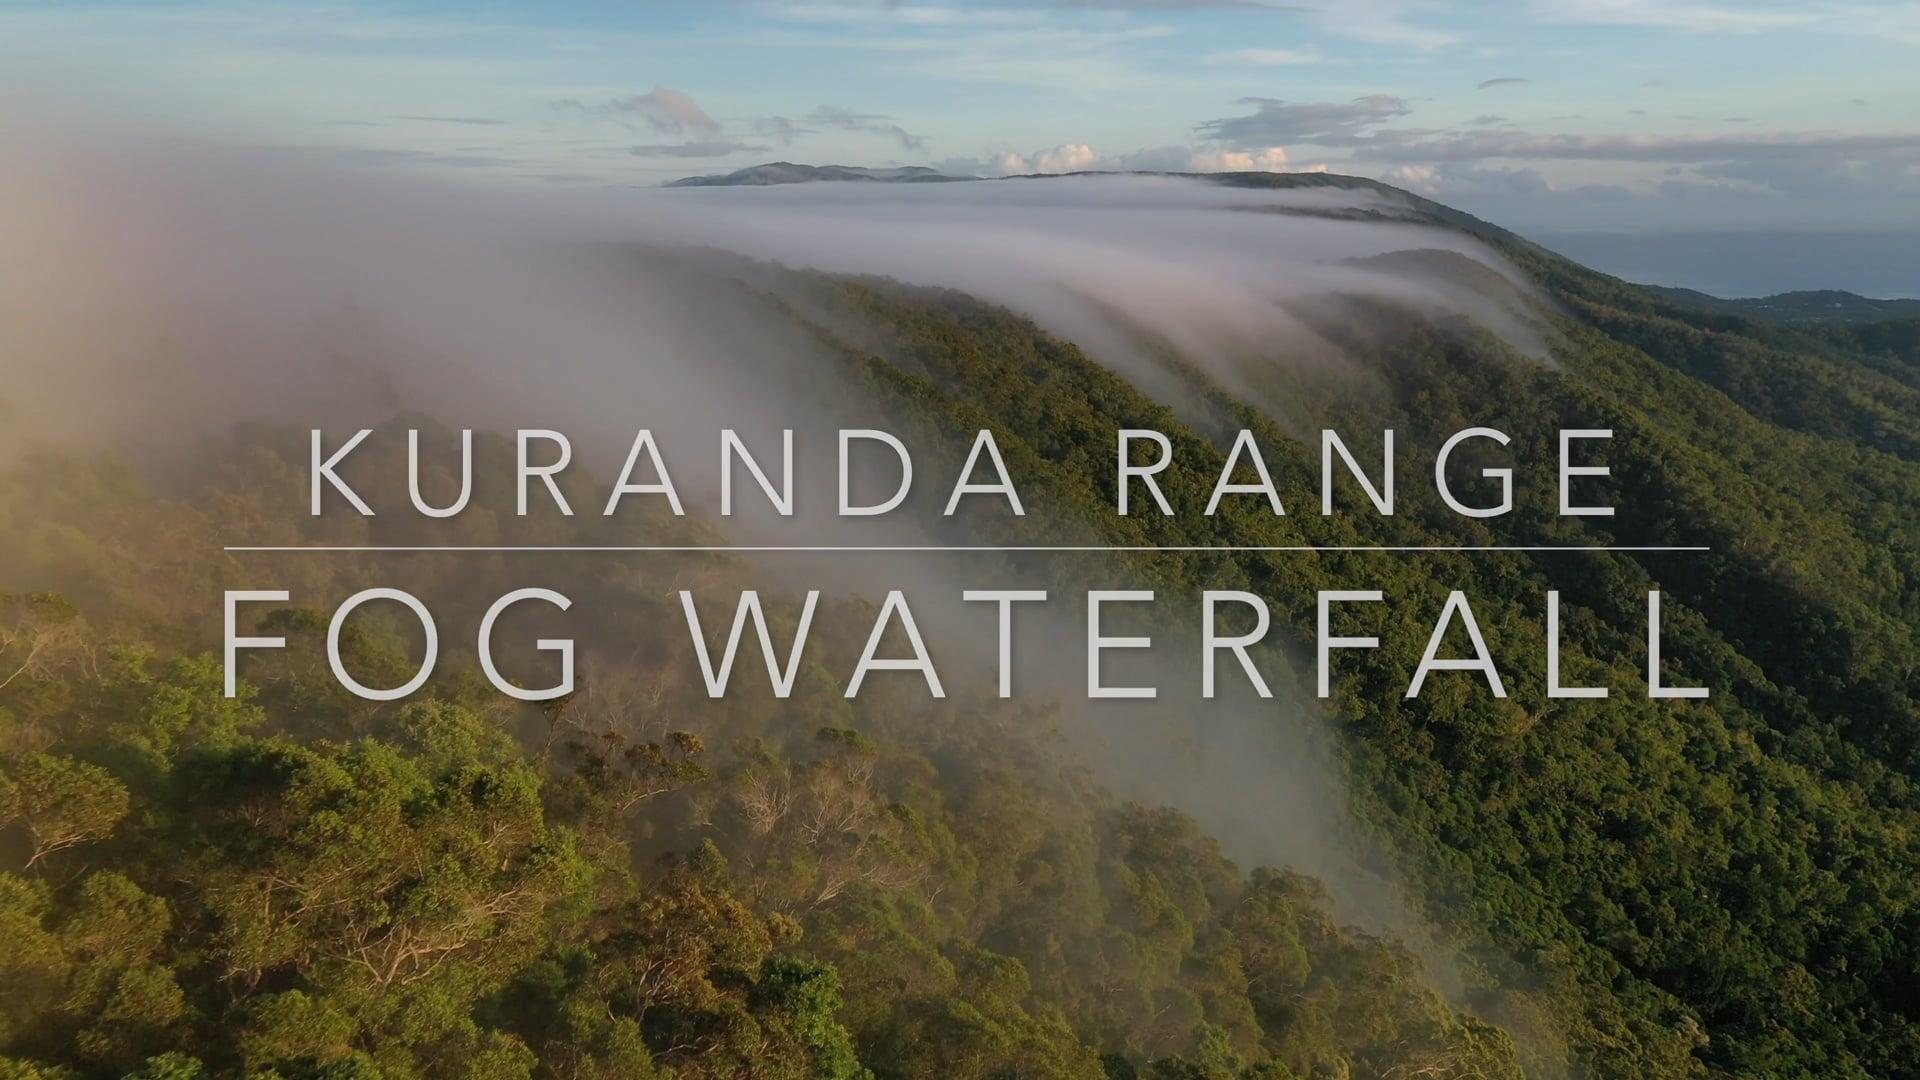 Kuaranda Range/Fog Waterfall